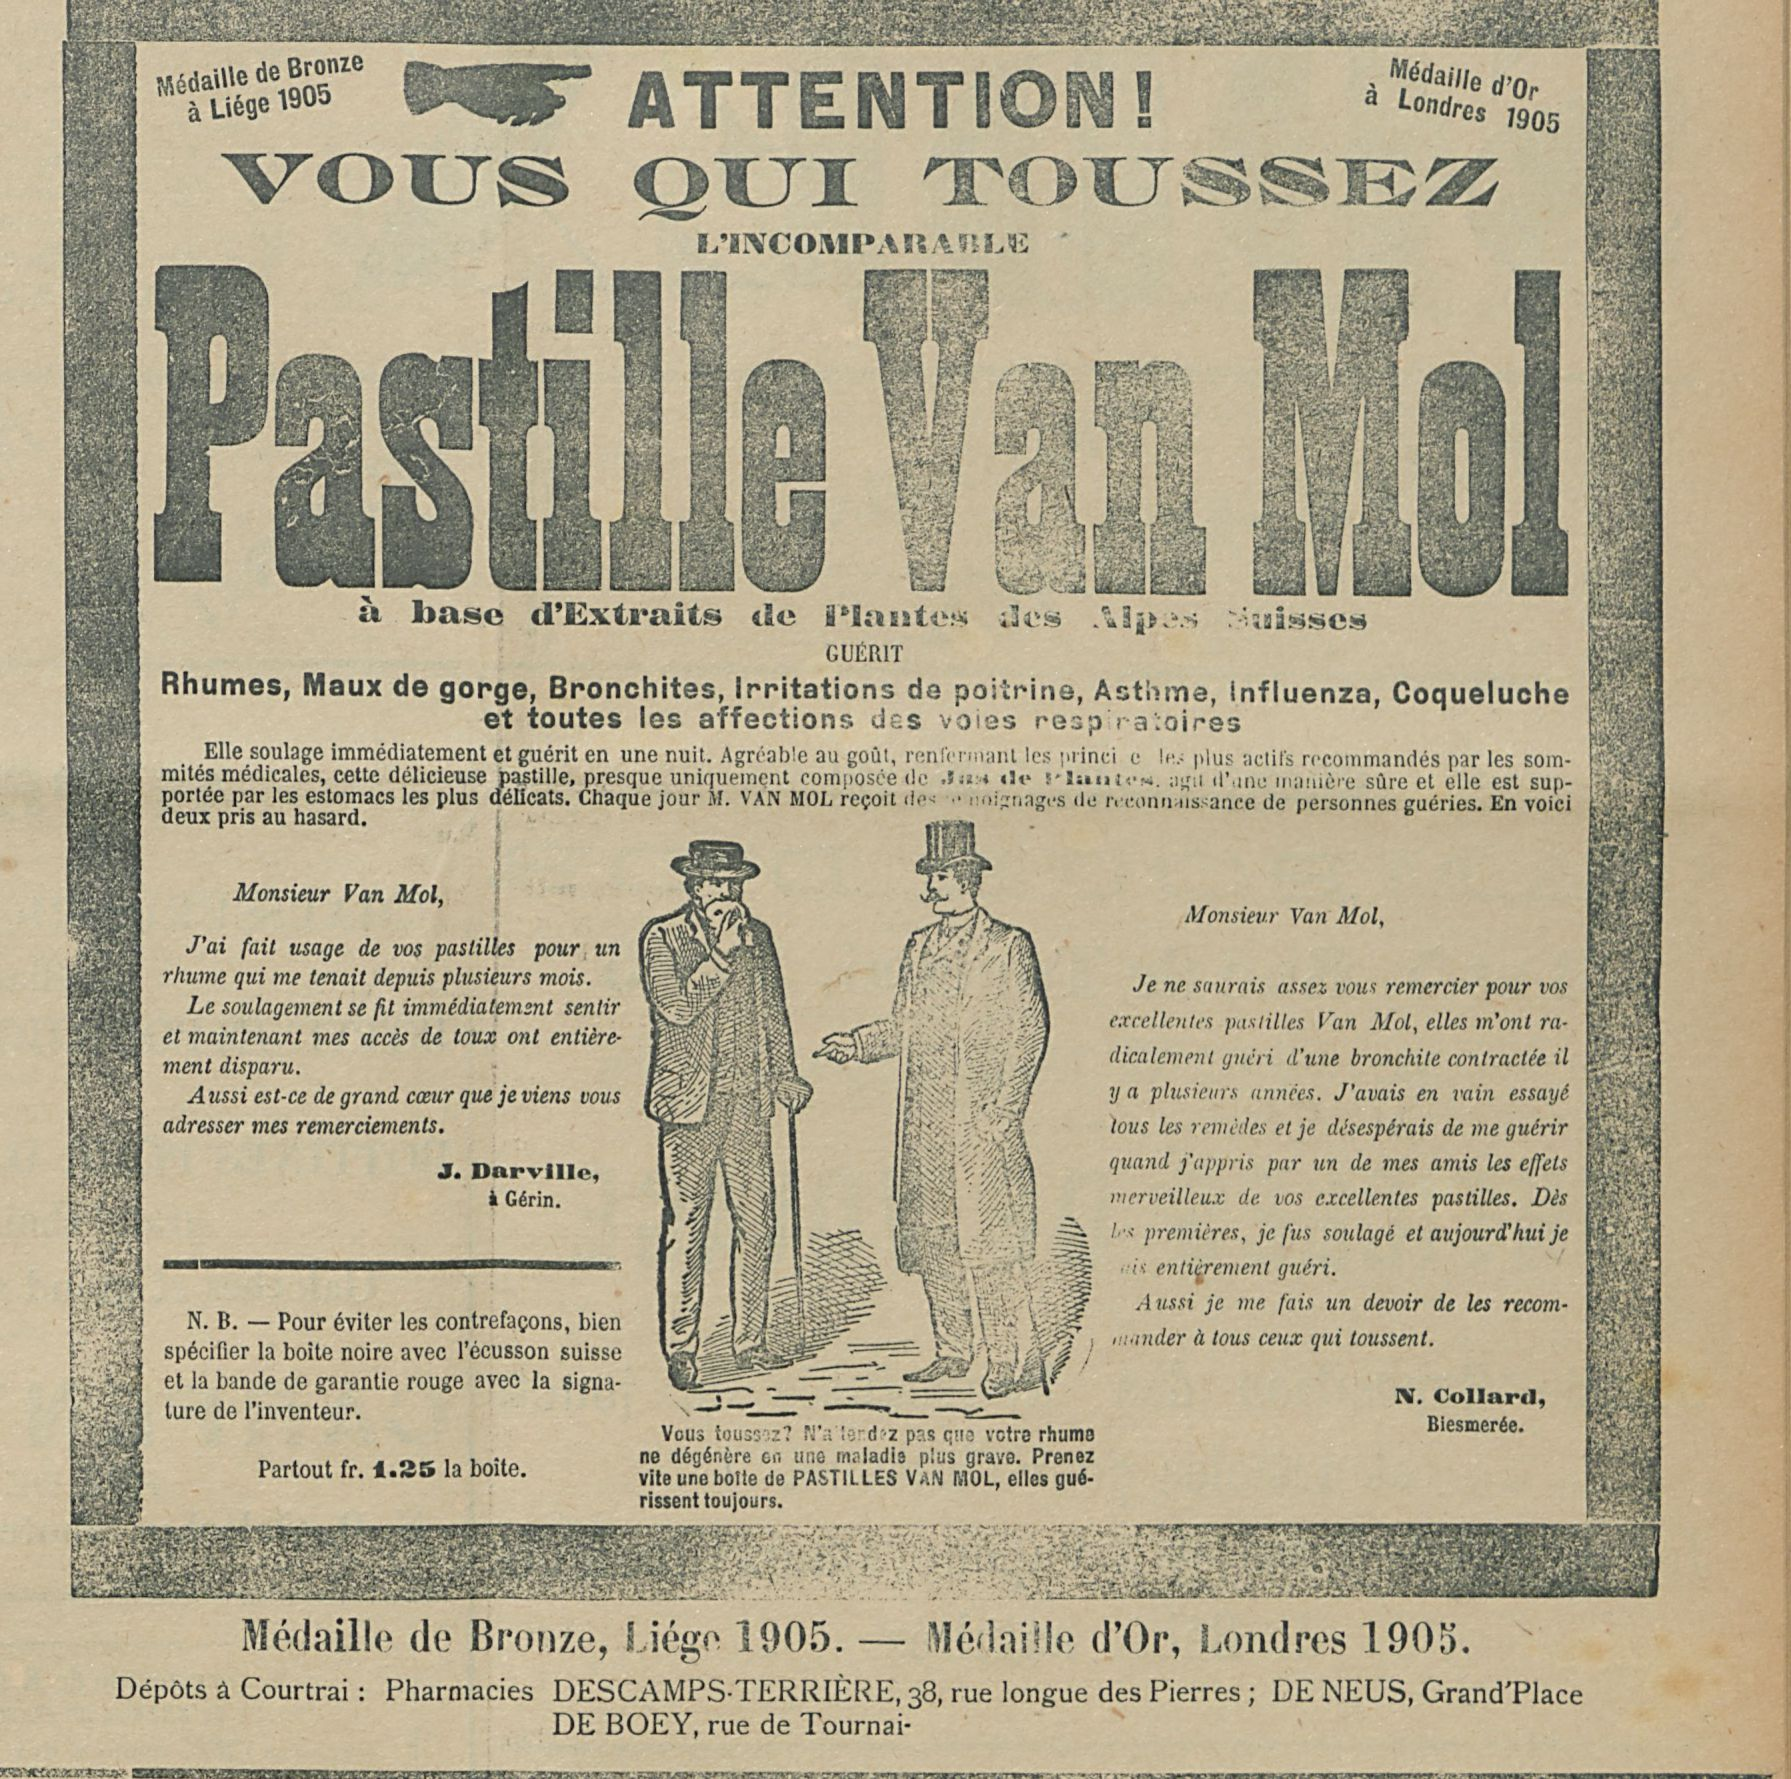 Pastille Van Mol